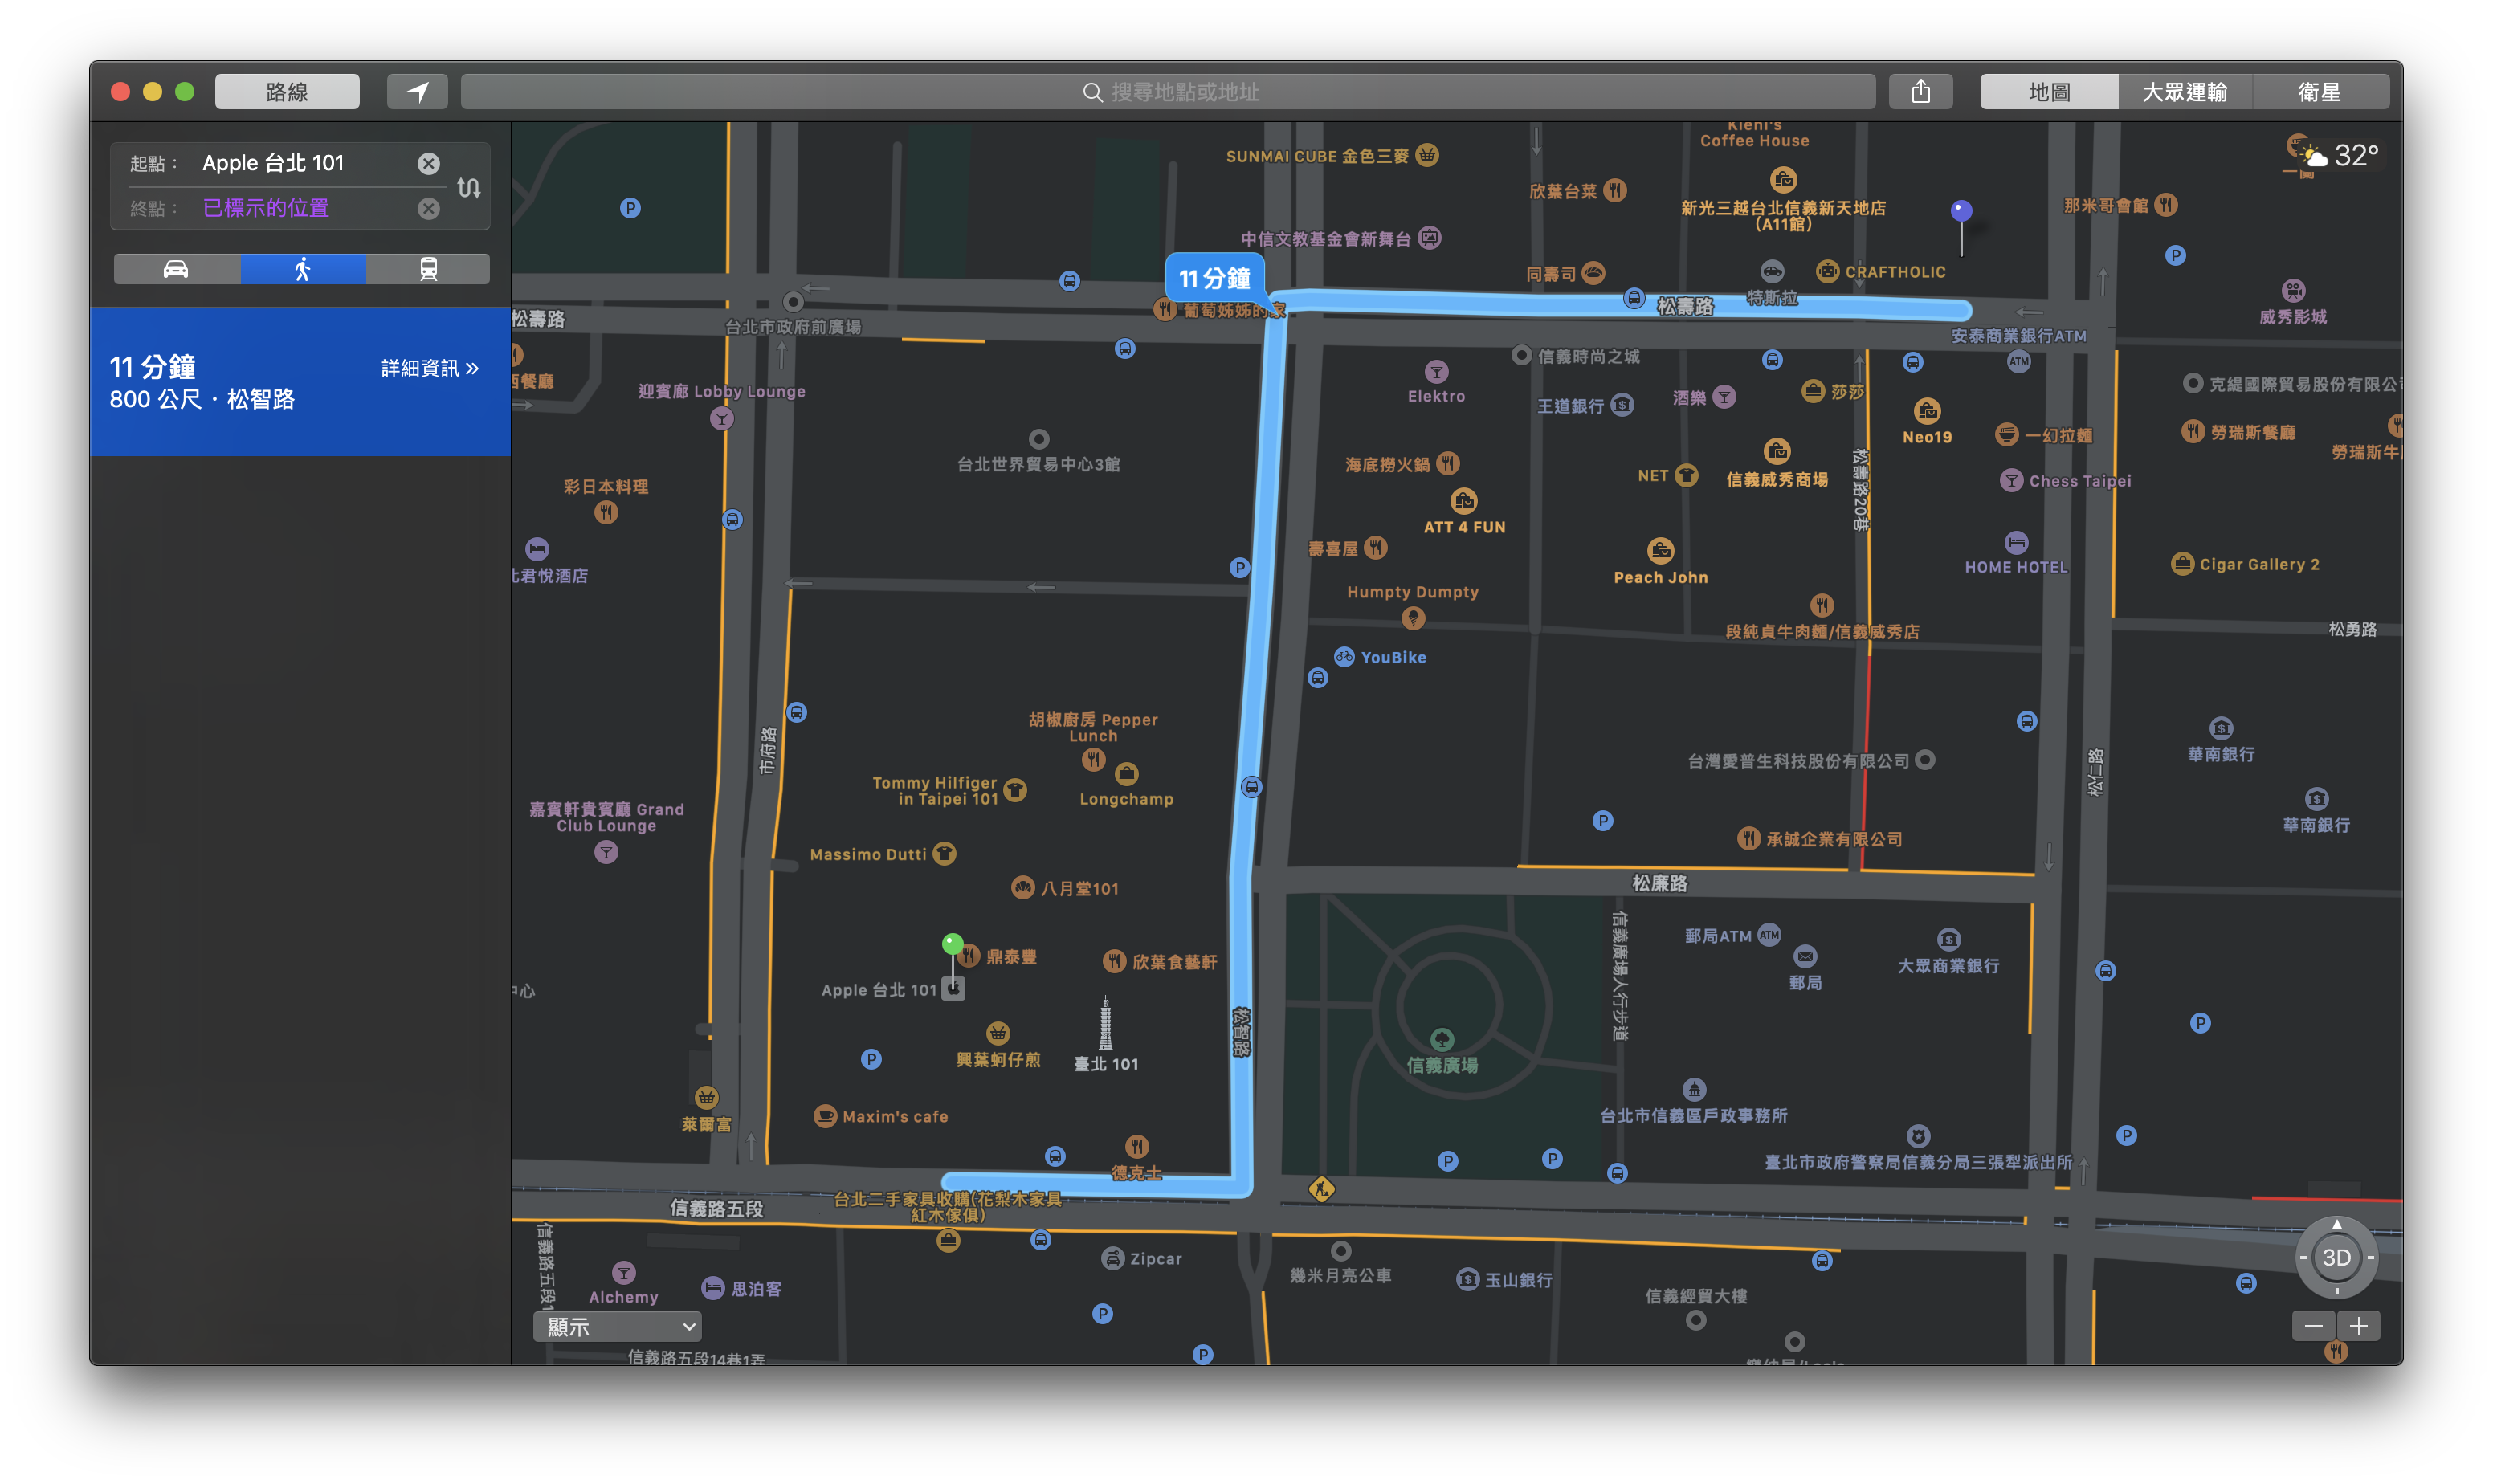 Apple Store、Apple Store 台灣、Apple 台灣